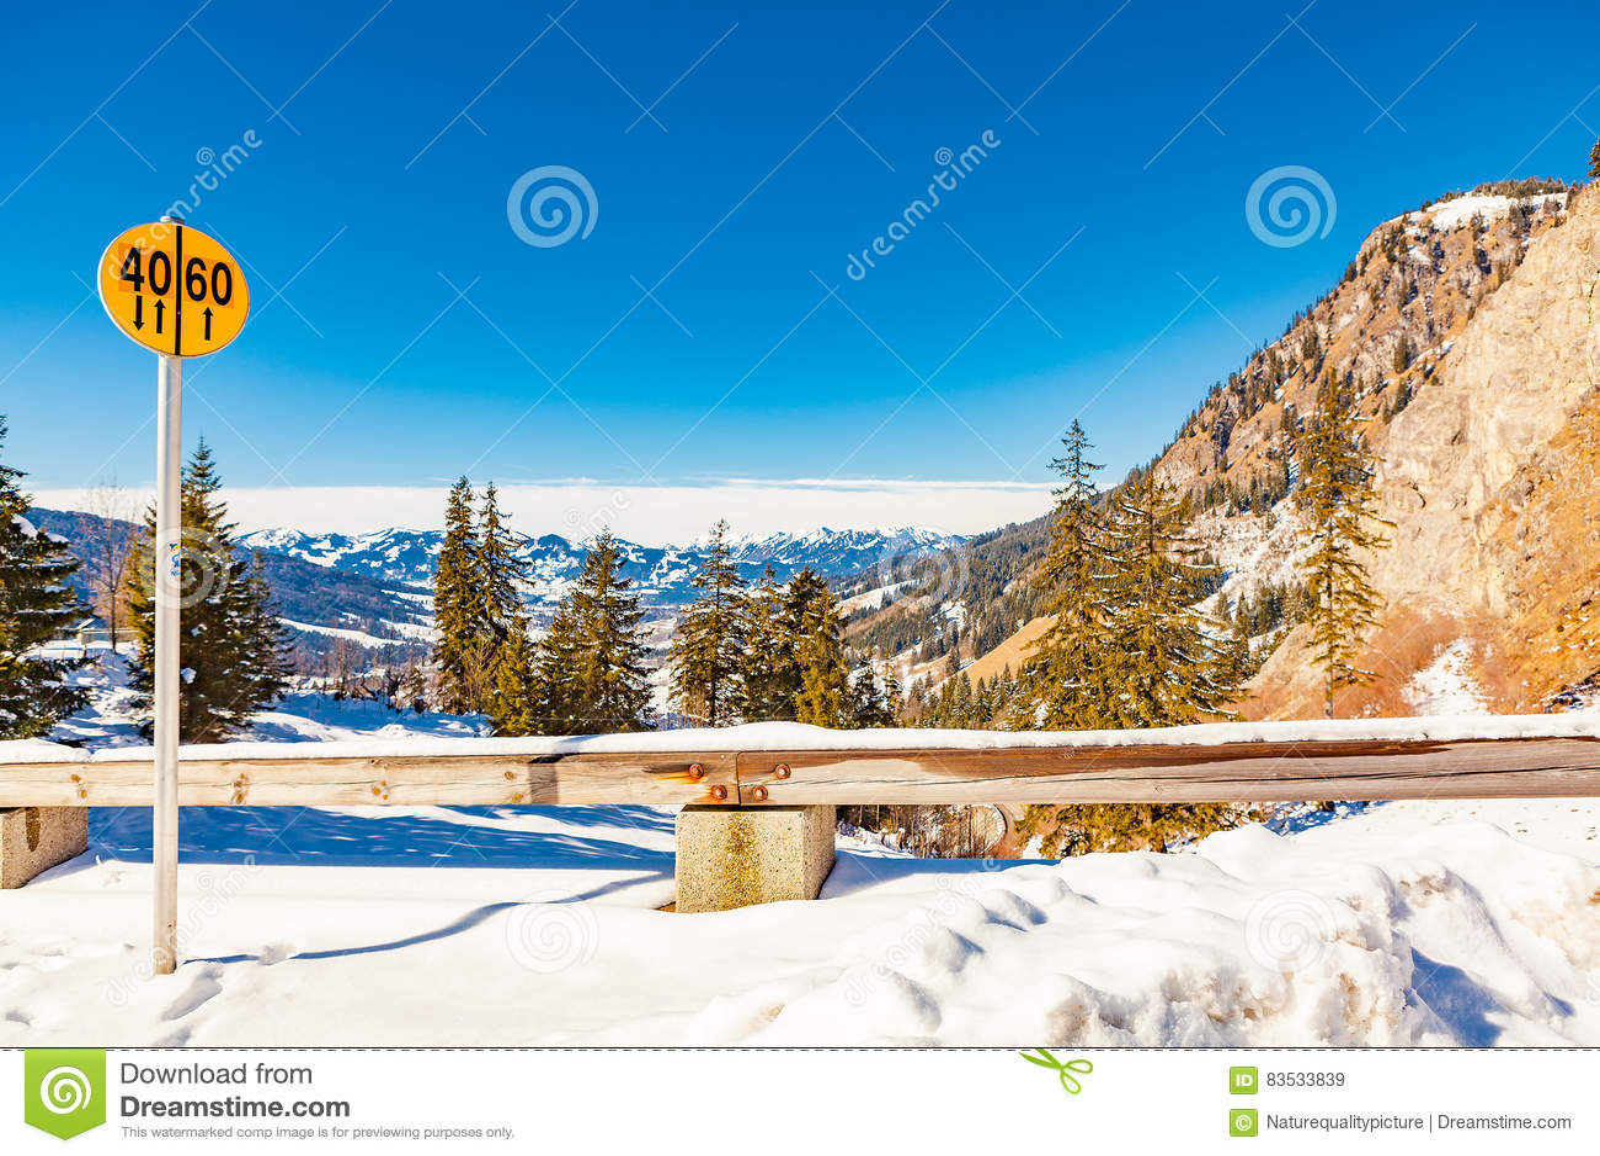 Oberjoch no inverno